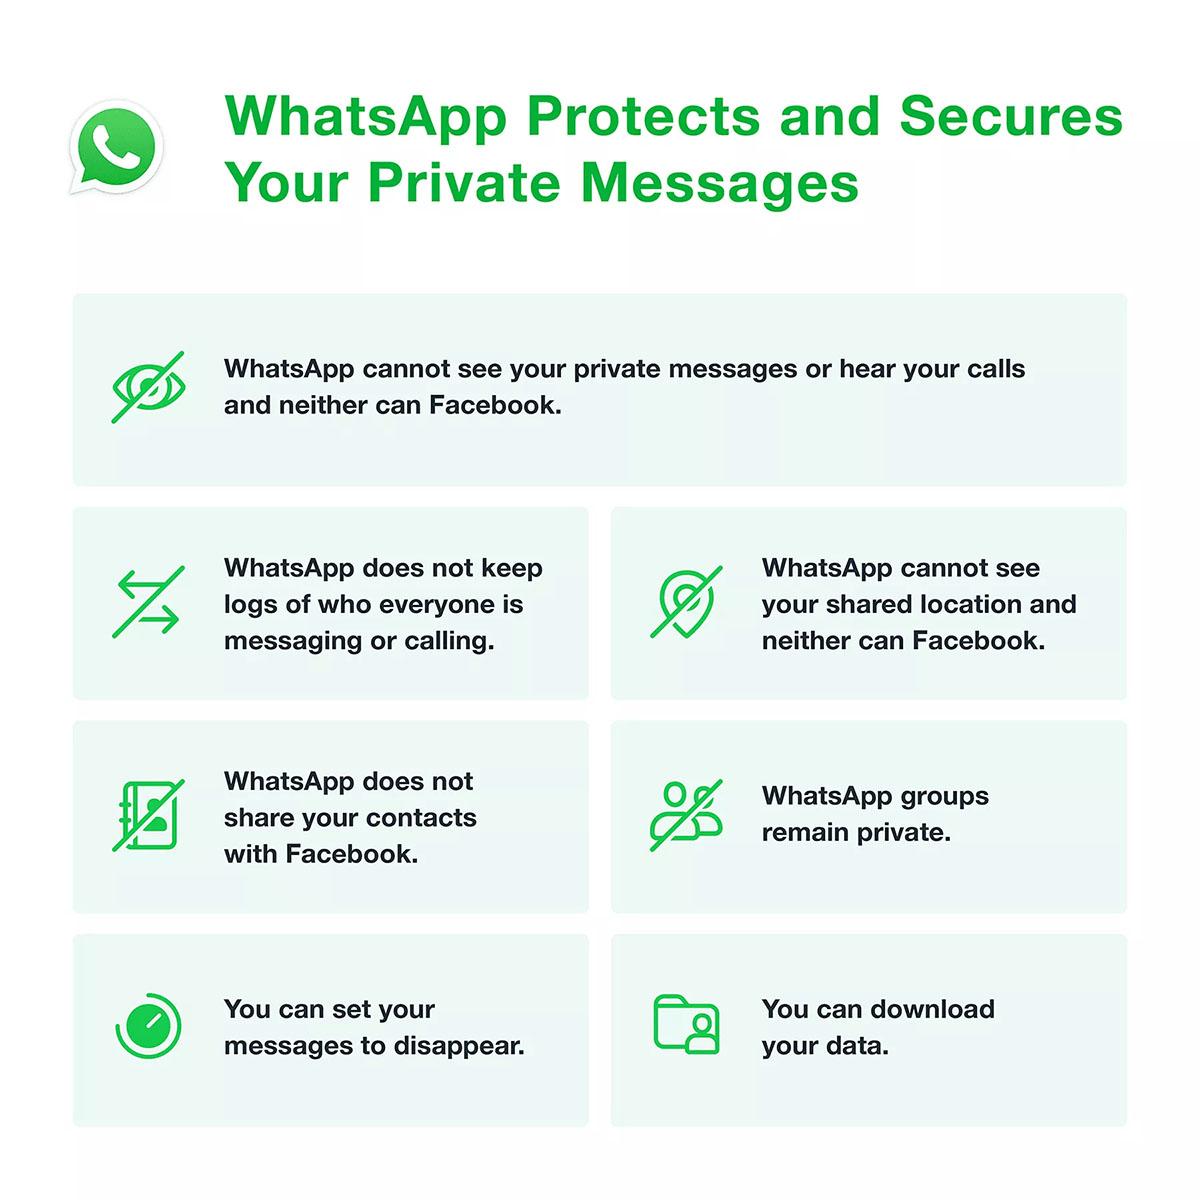 whatsapp prywatnosc